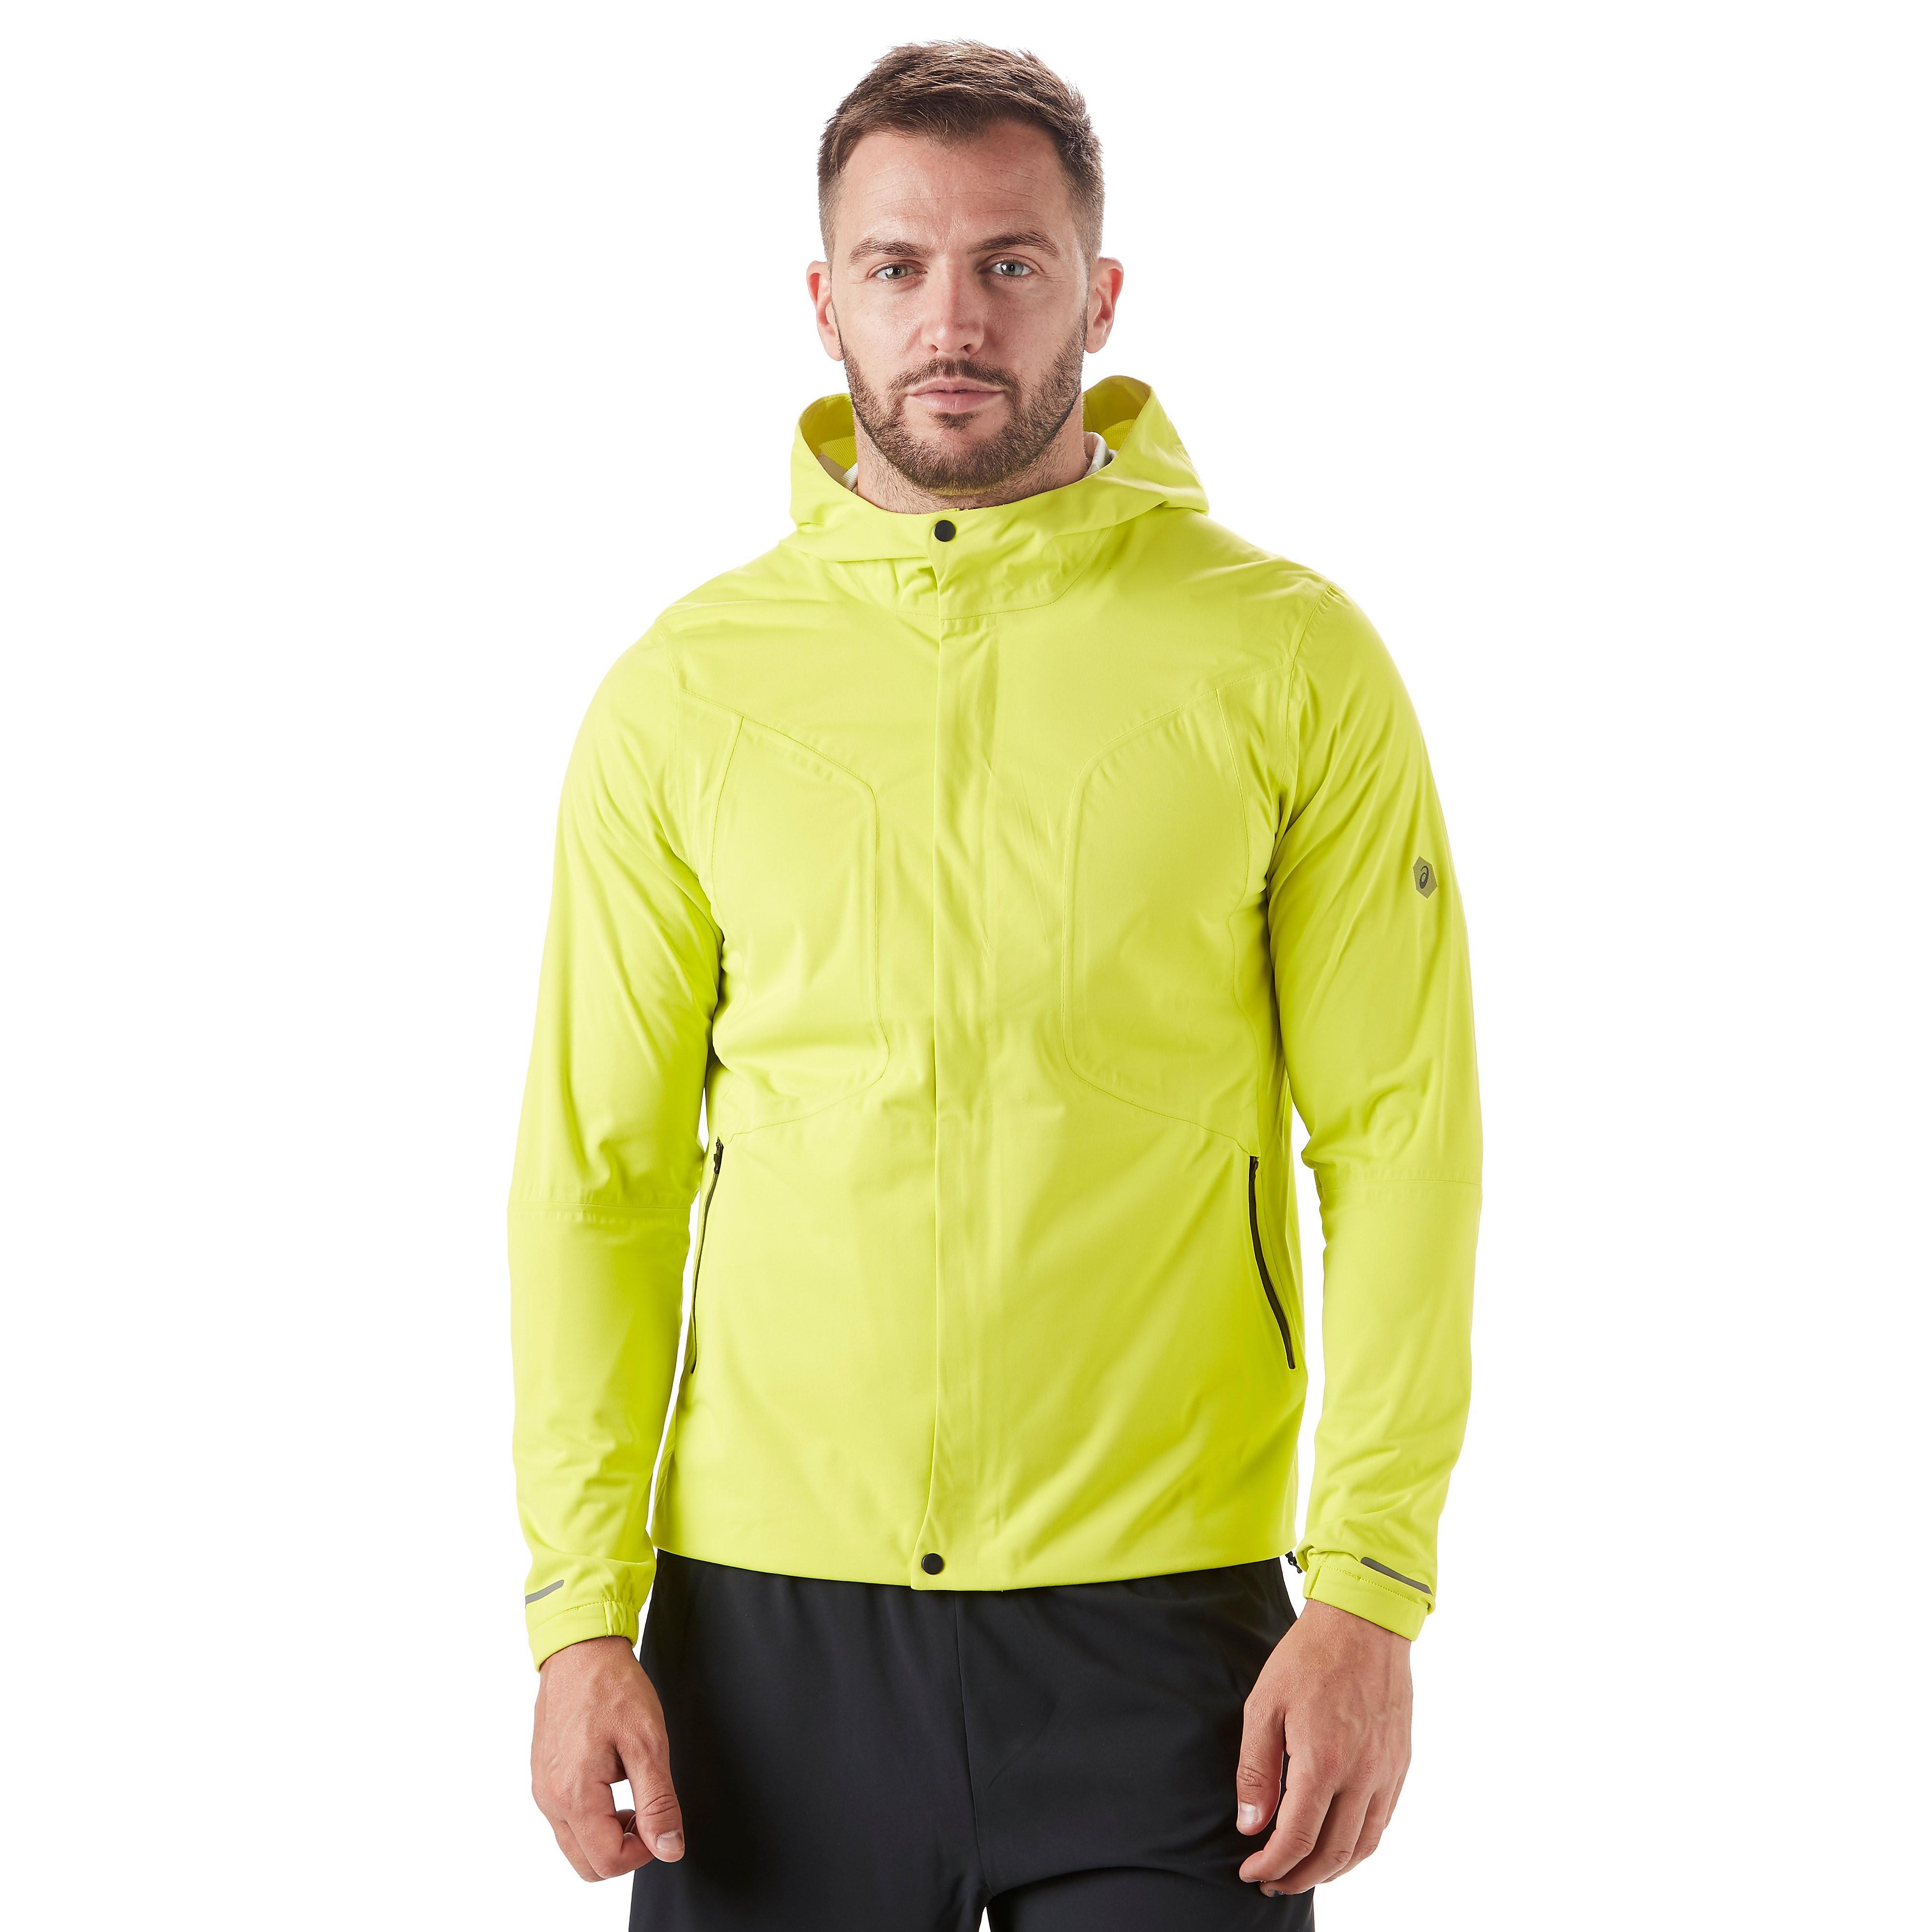 ASICS Accelerate Men's Running Jacket